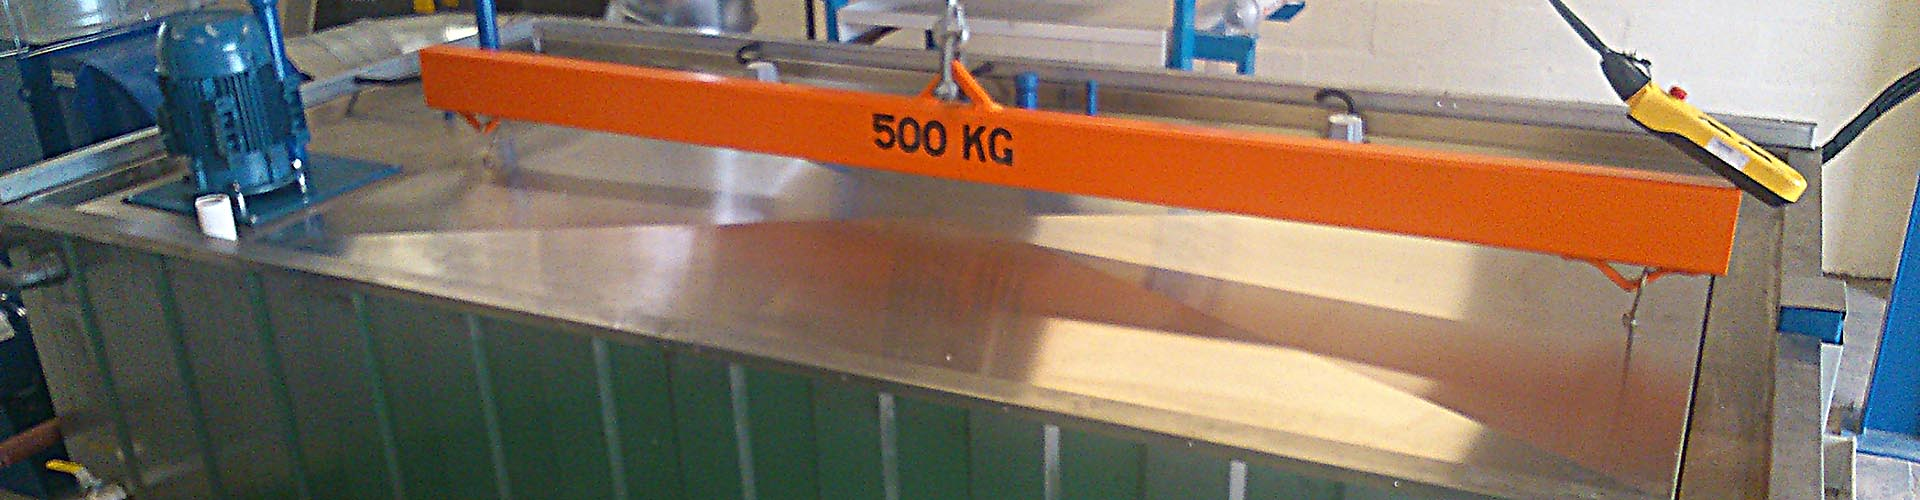 Stripping System for Alloy Wheels - BKR Plant supplies Internationally